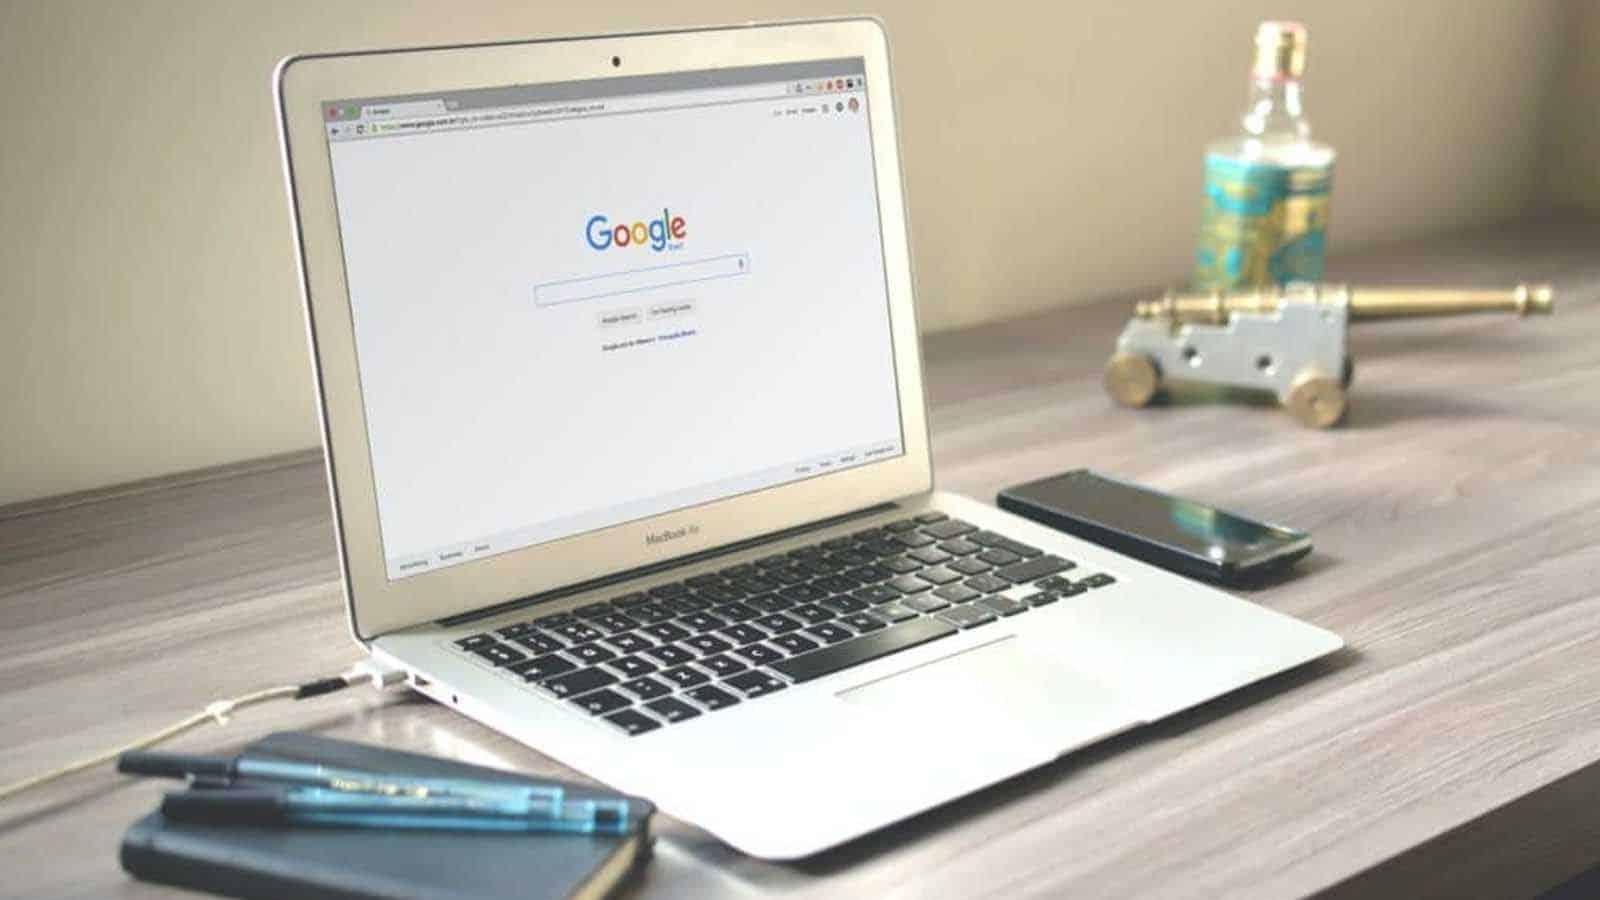 google chrome on a macbook